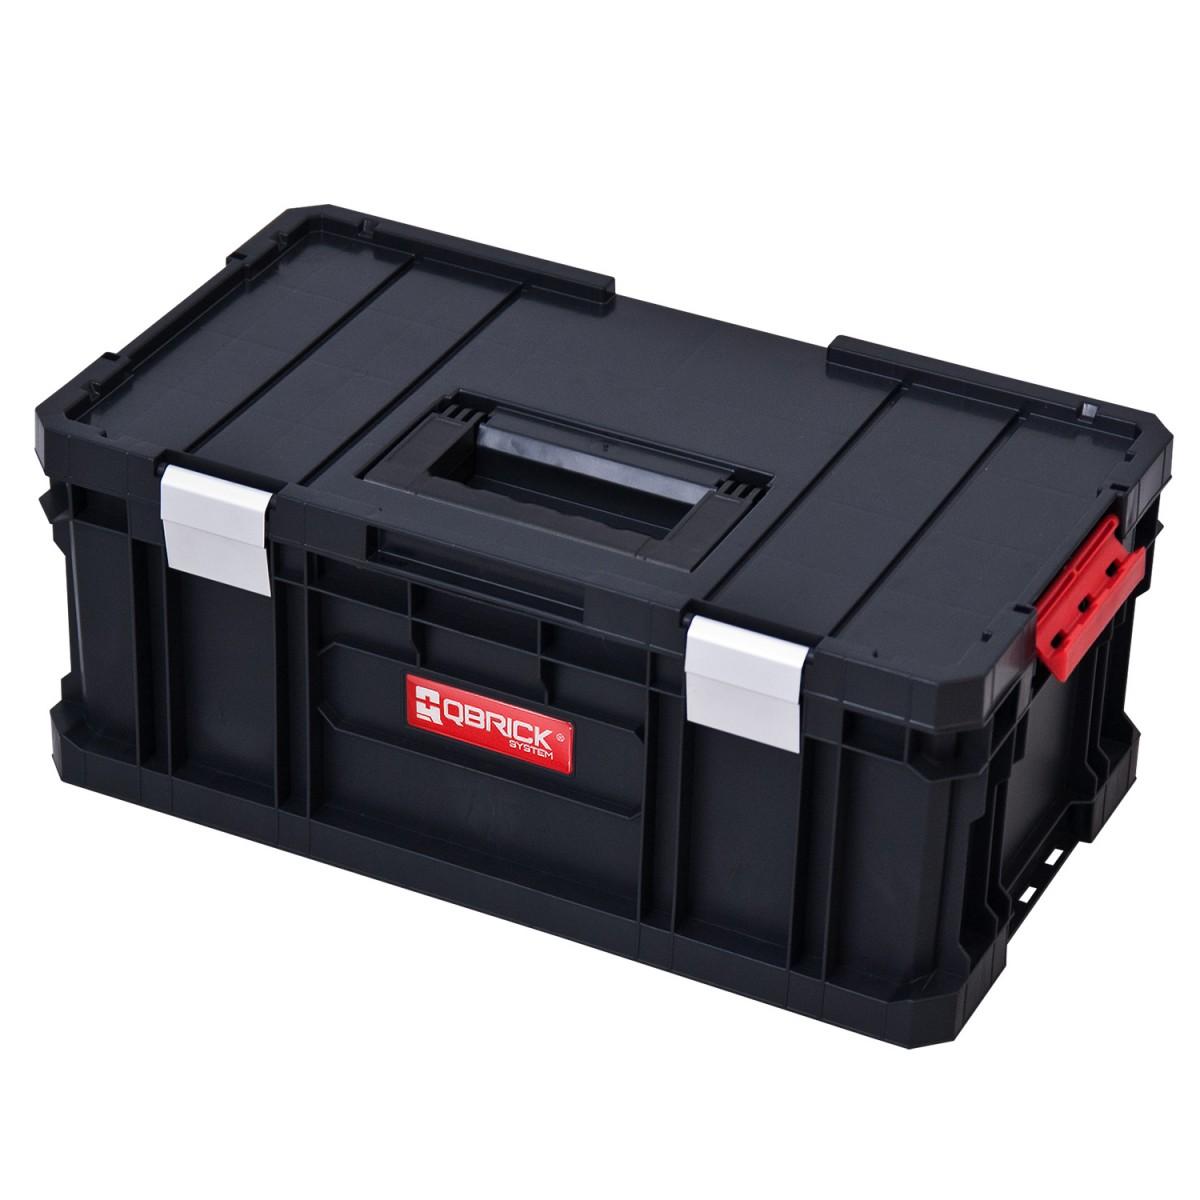 Kufr na nářadí Box QBRICK® System TWO Toolbox